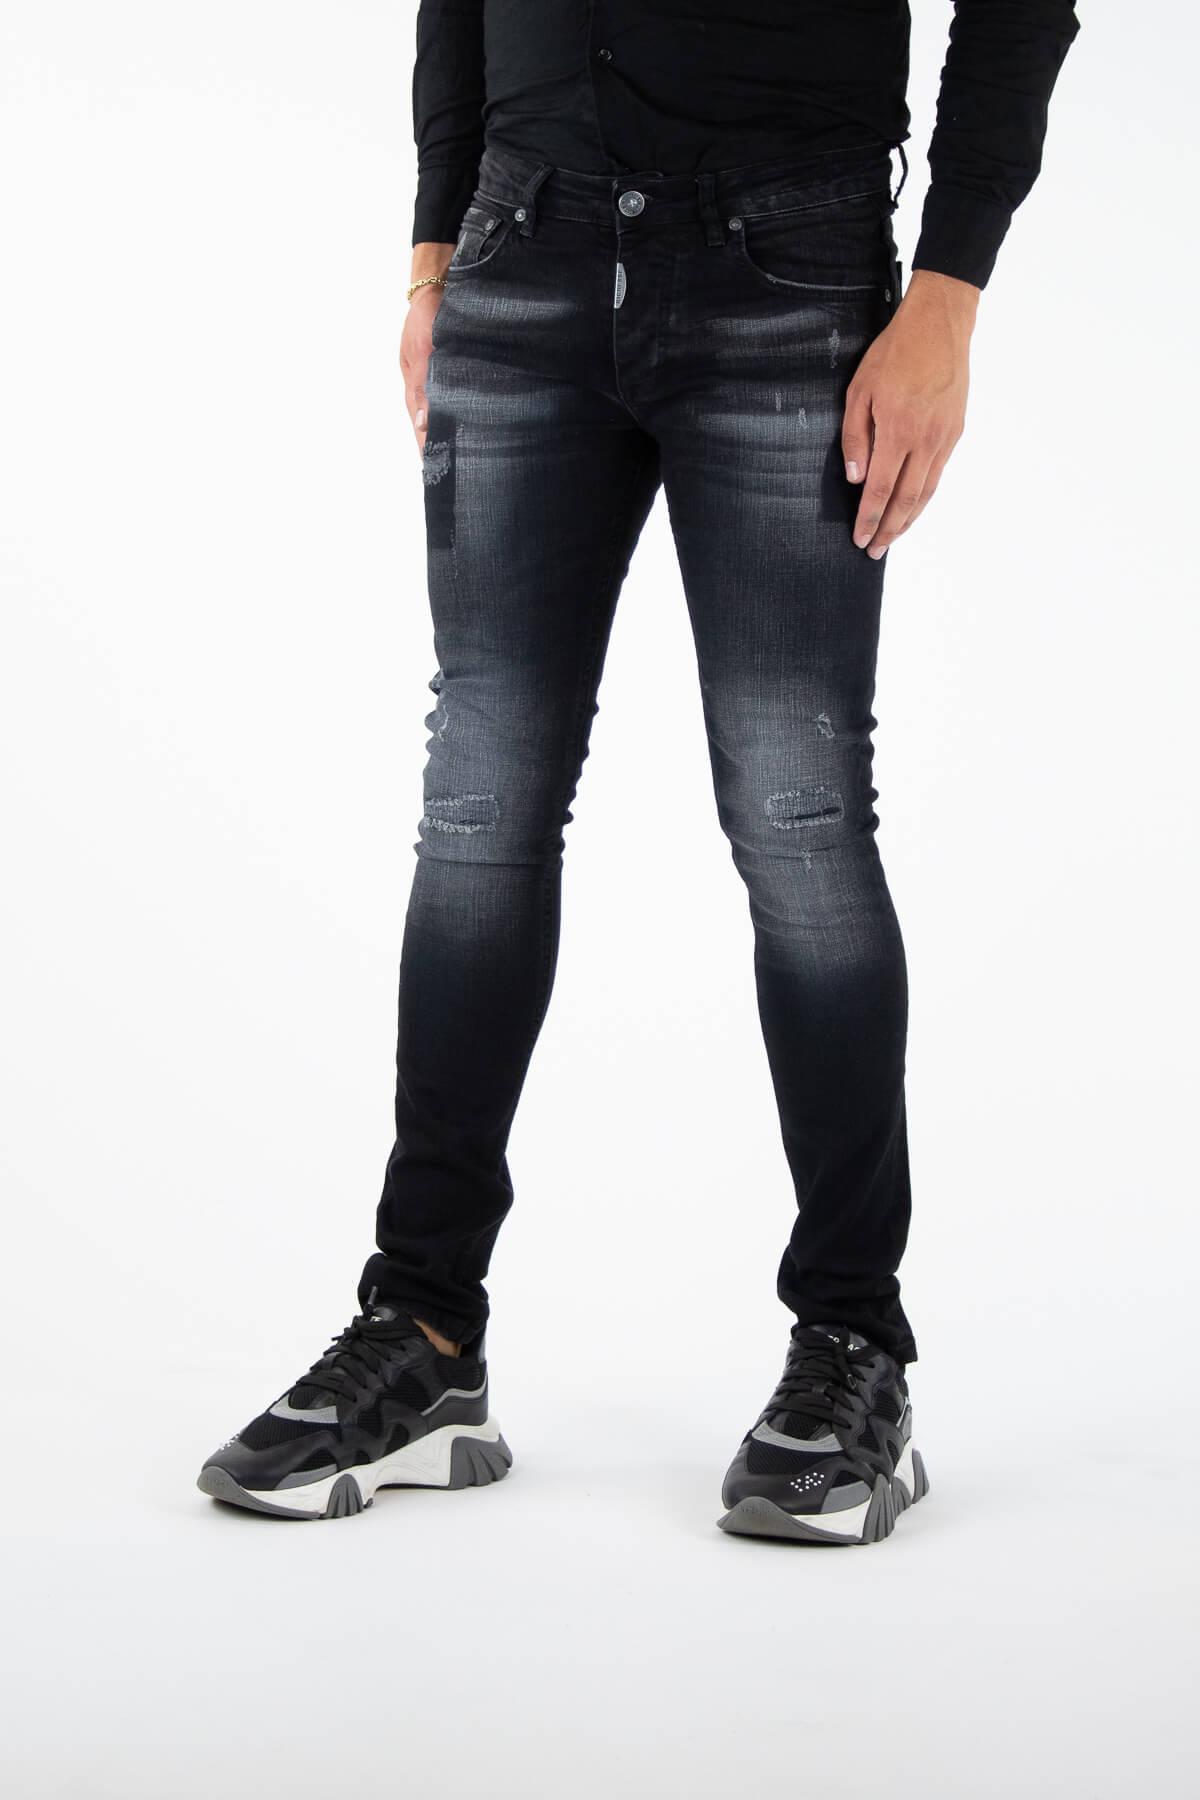 Novara Black Jeans-3